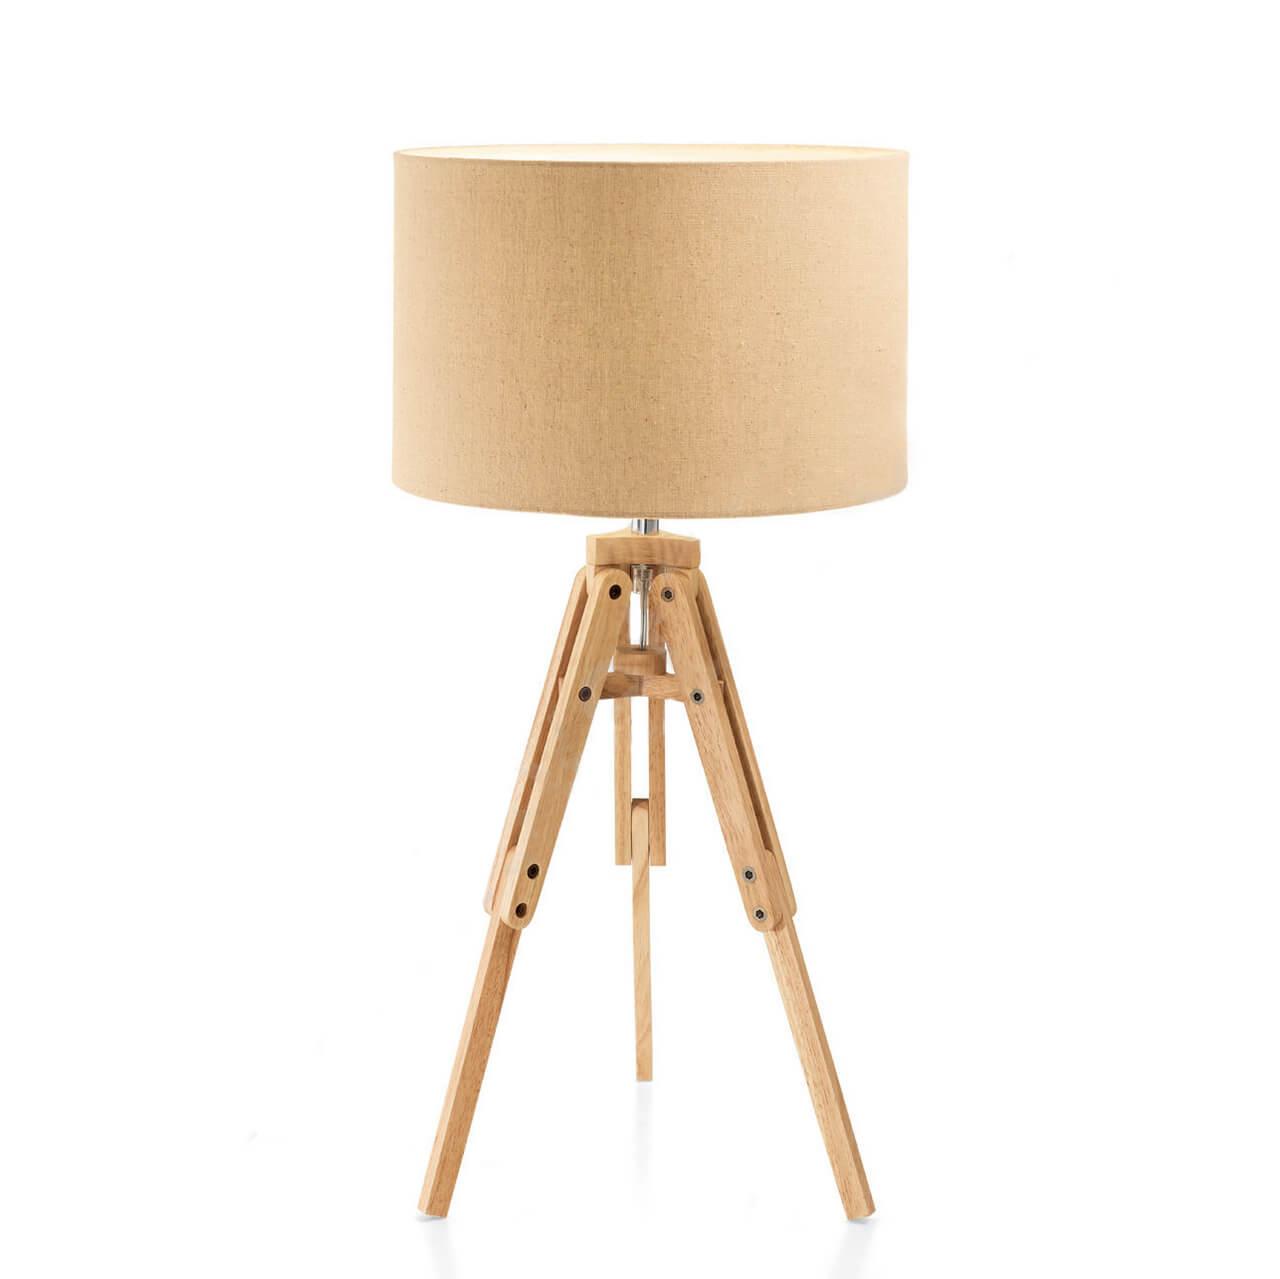 Настольная лампа Ideal Lux Klimt TL1 недорого